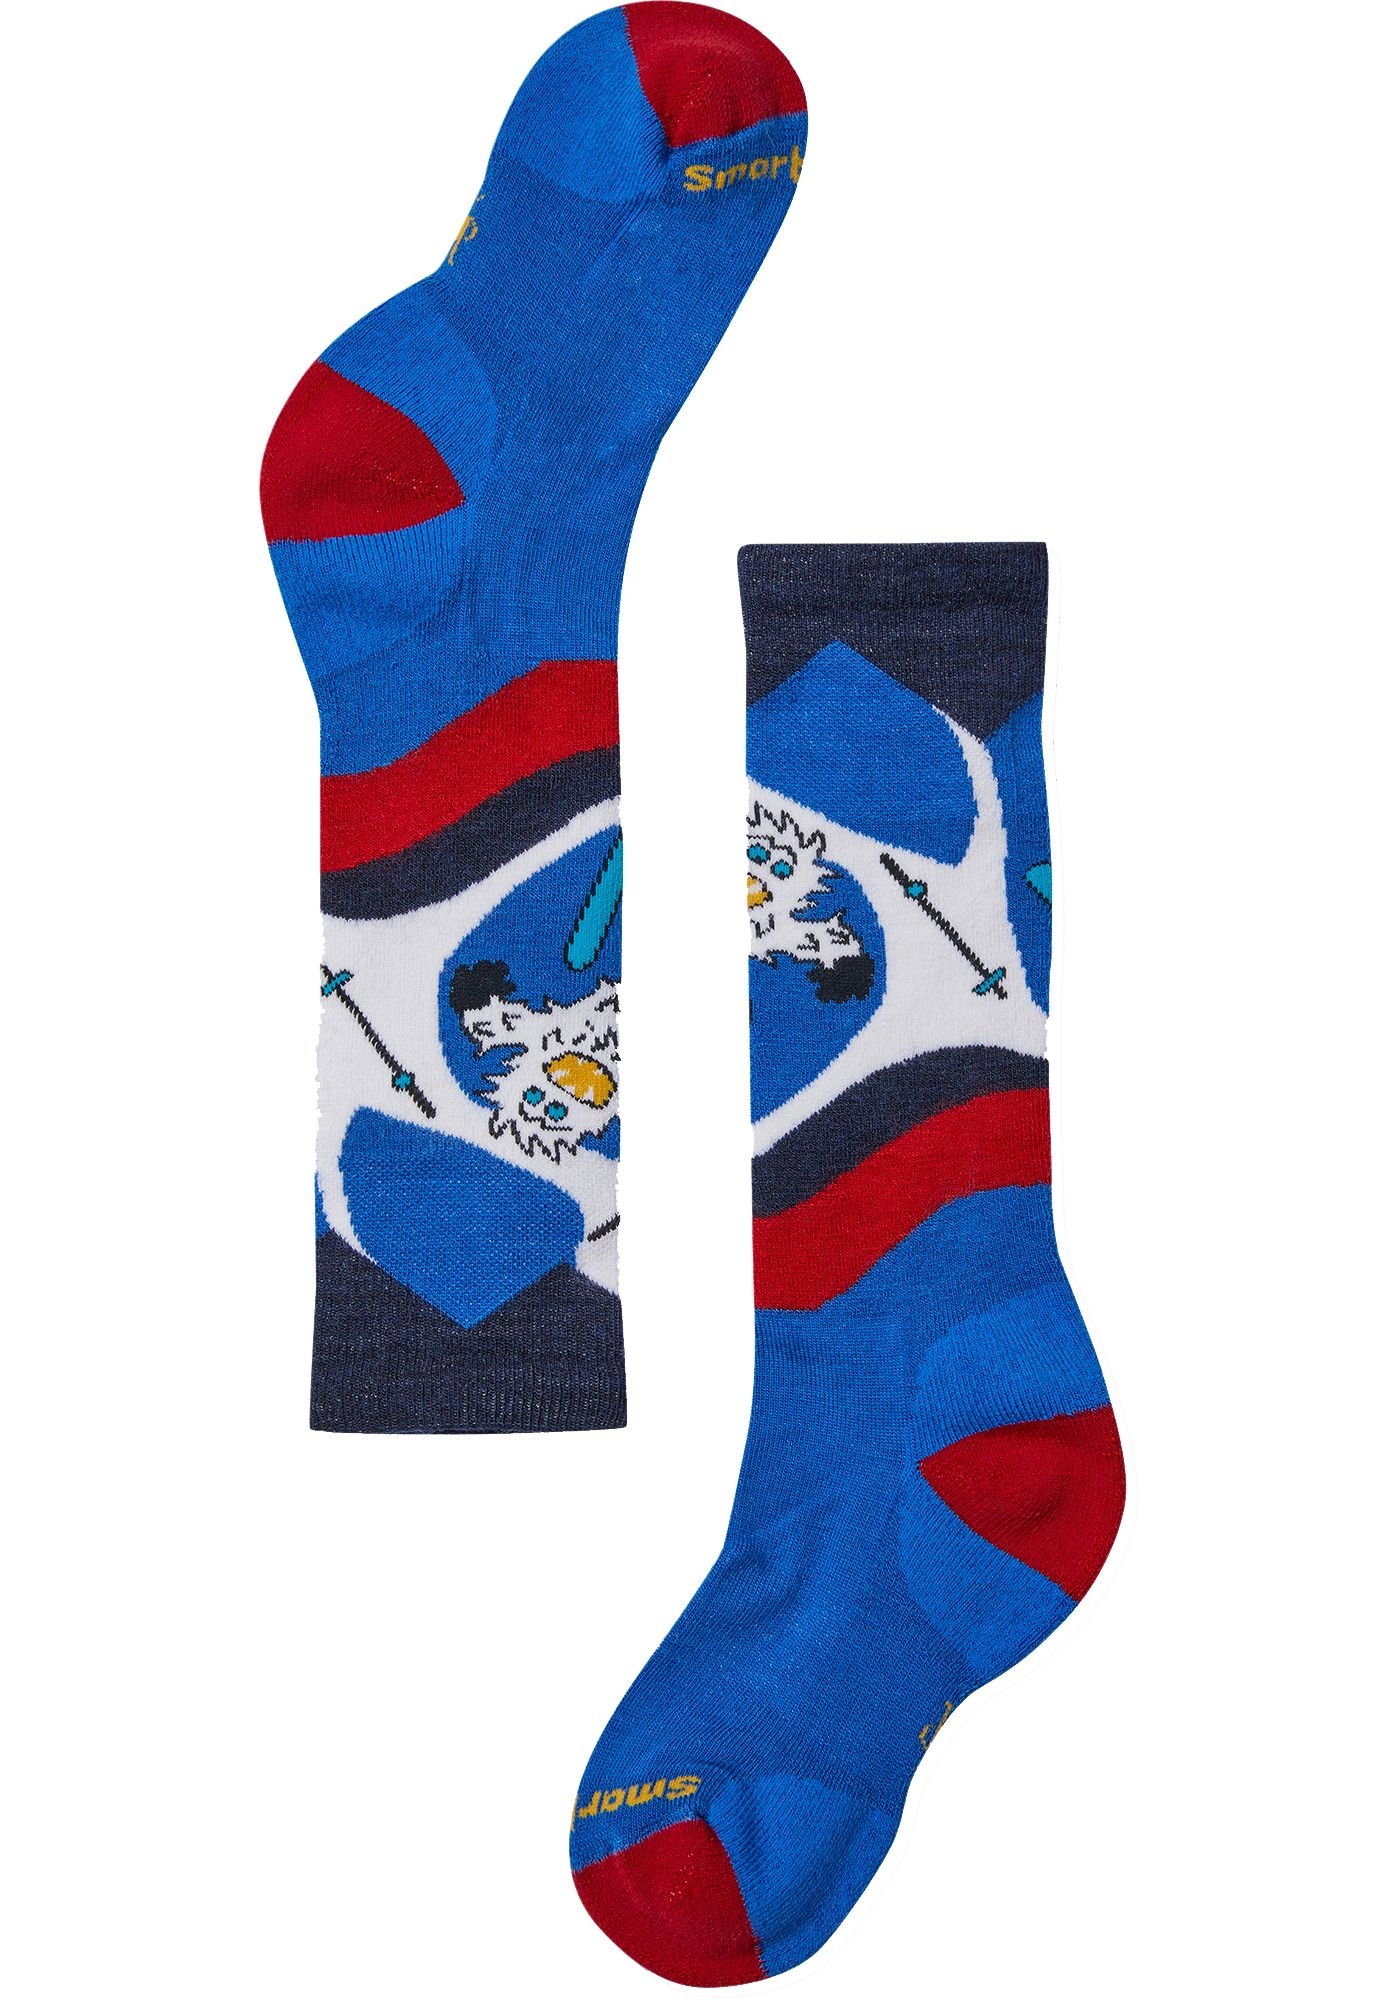 Smartwool Youth Wintersport Yo Yetti Over-the-Calf Socks